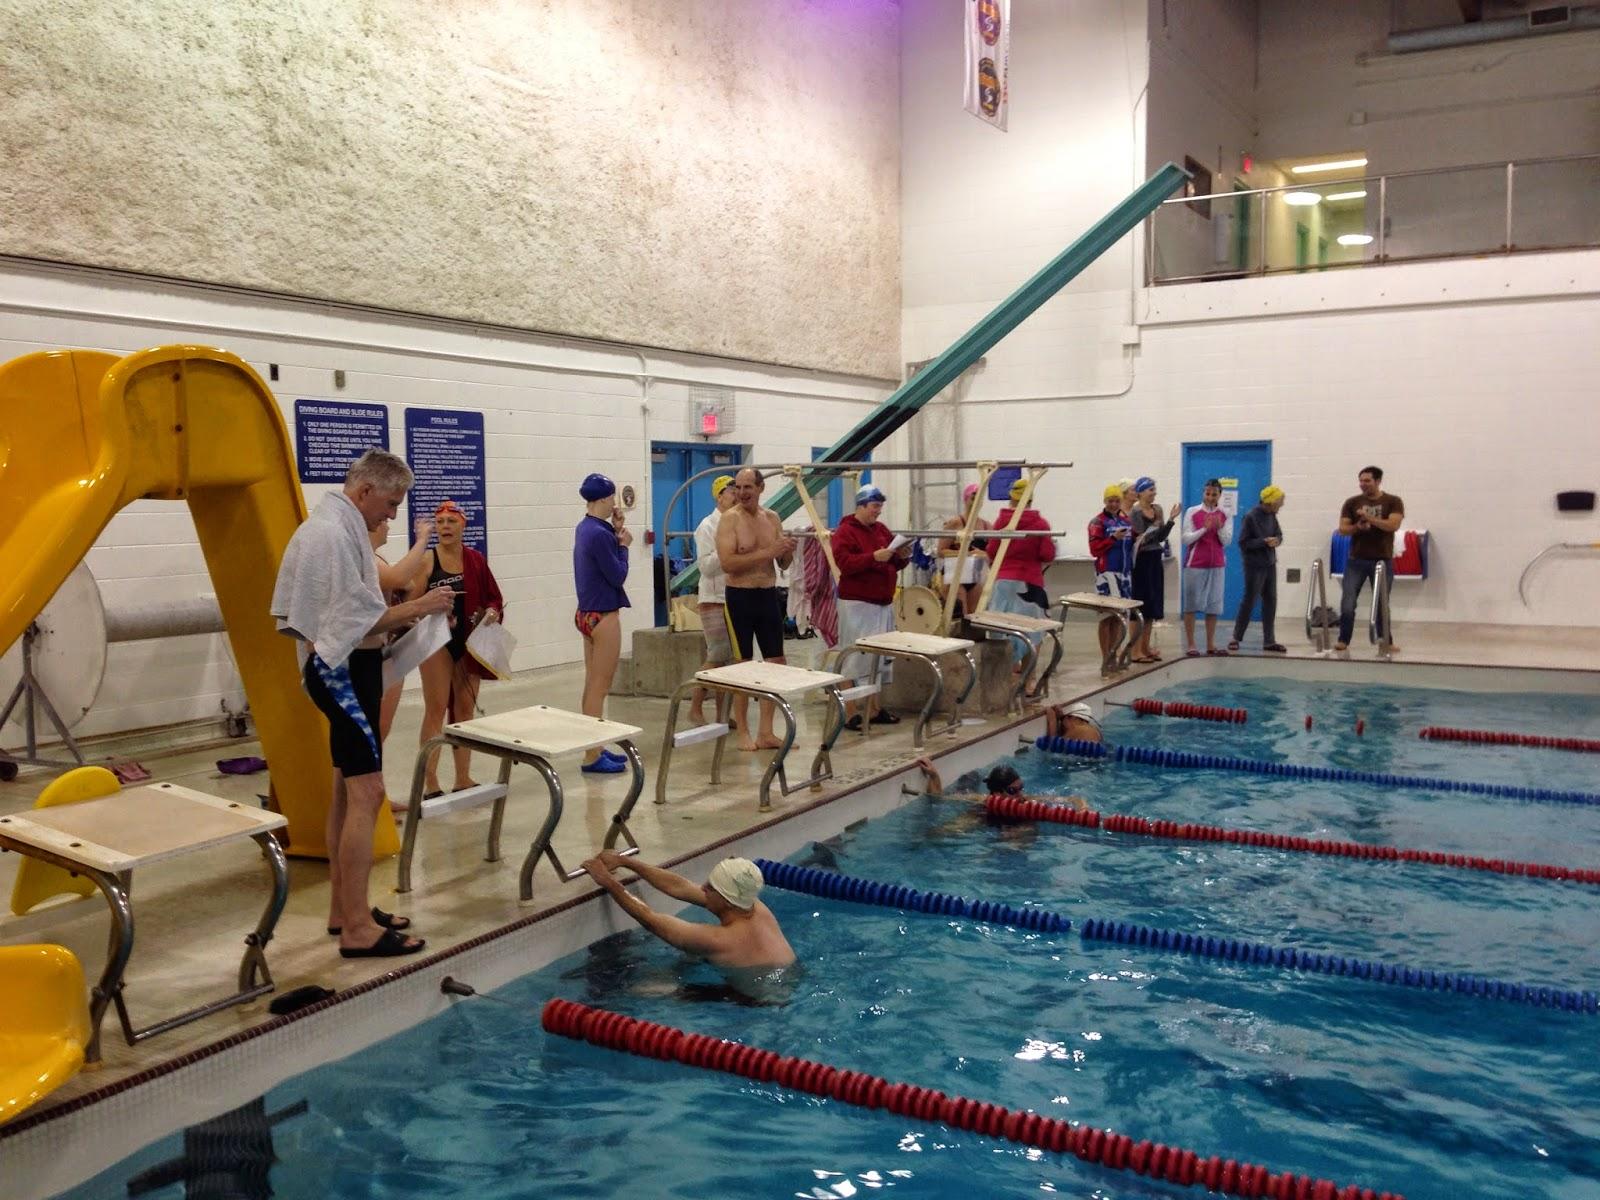 nitro swim meet june 7 8 2014